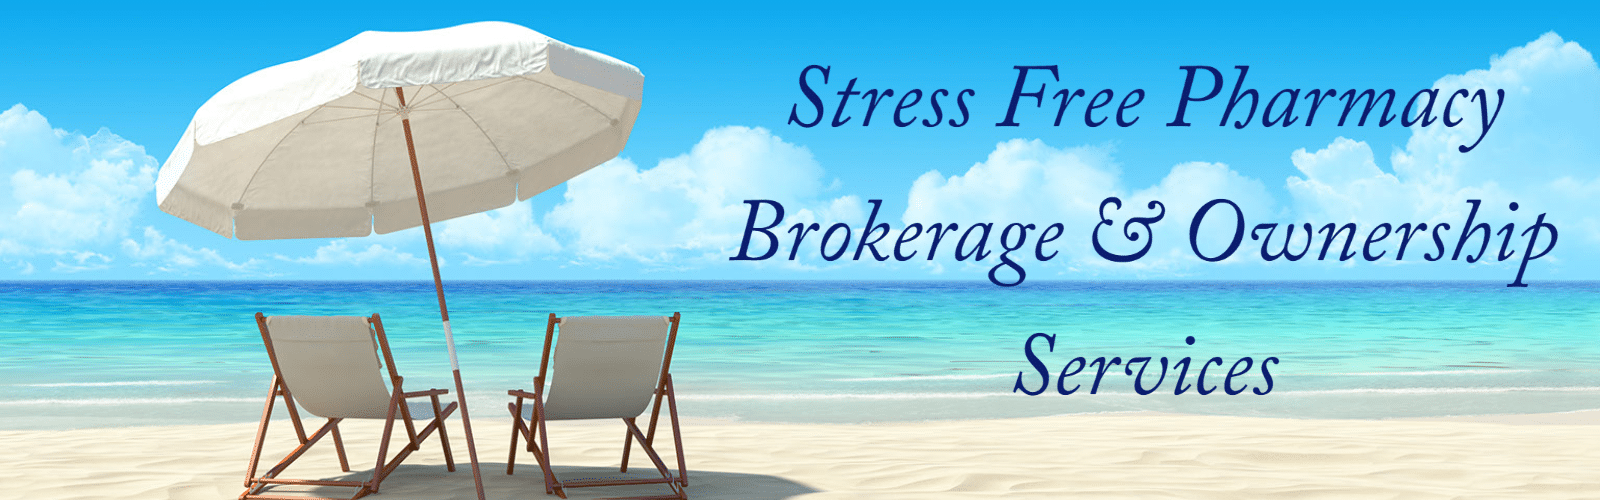 pharmacy brokerage, PRS Pharmacy Services